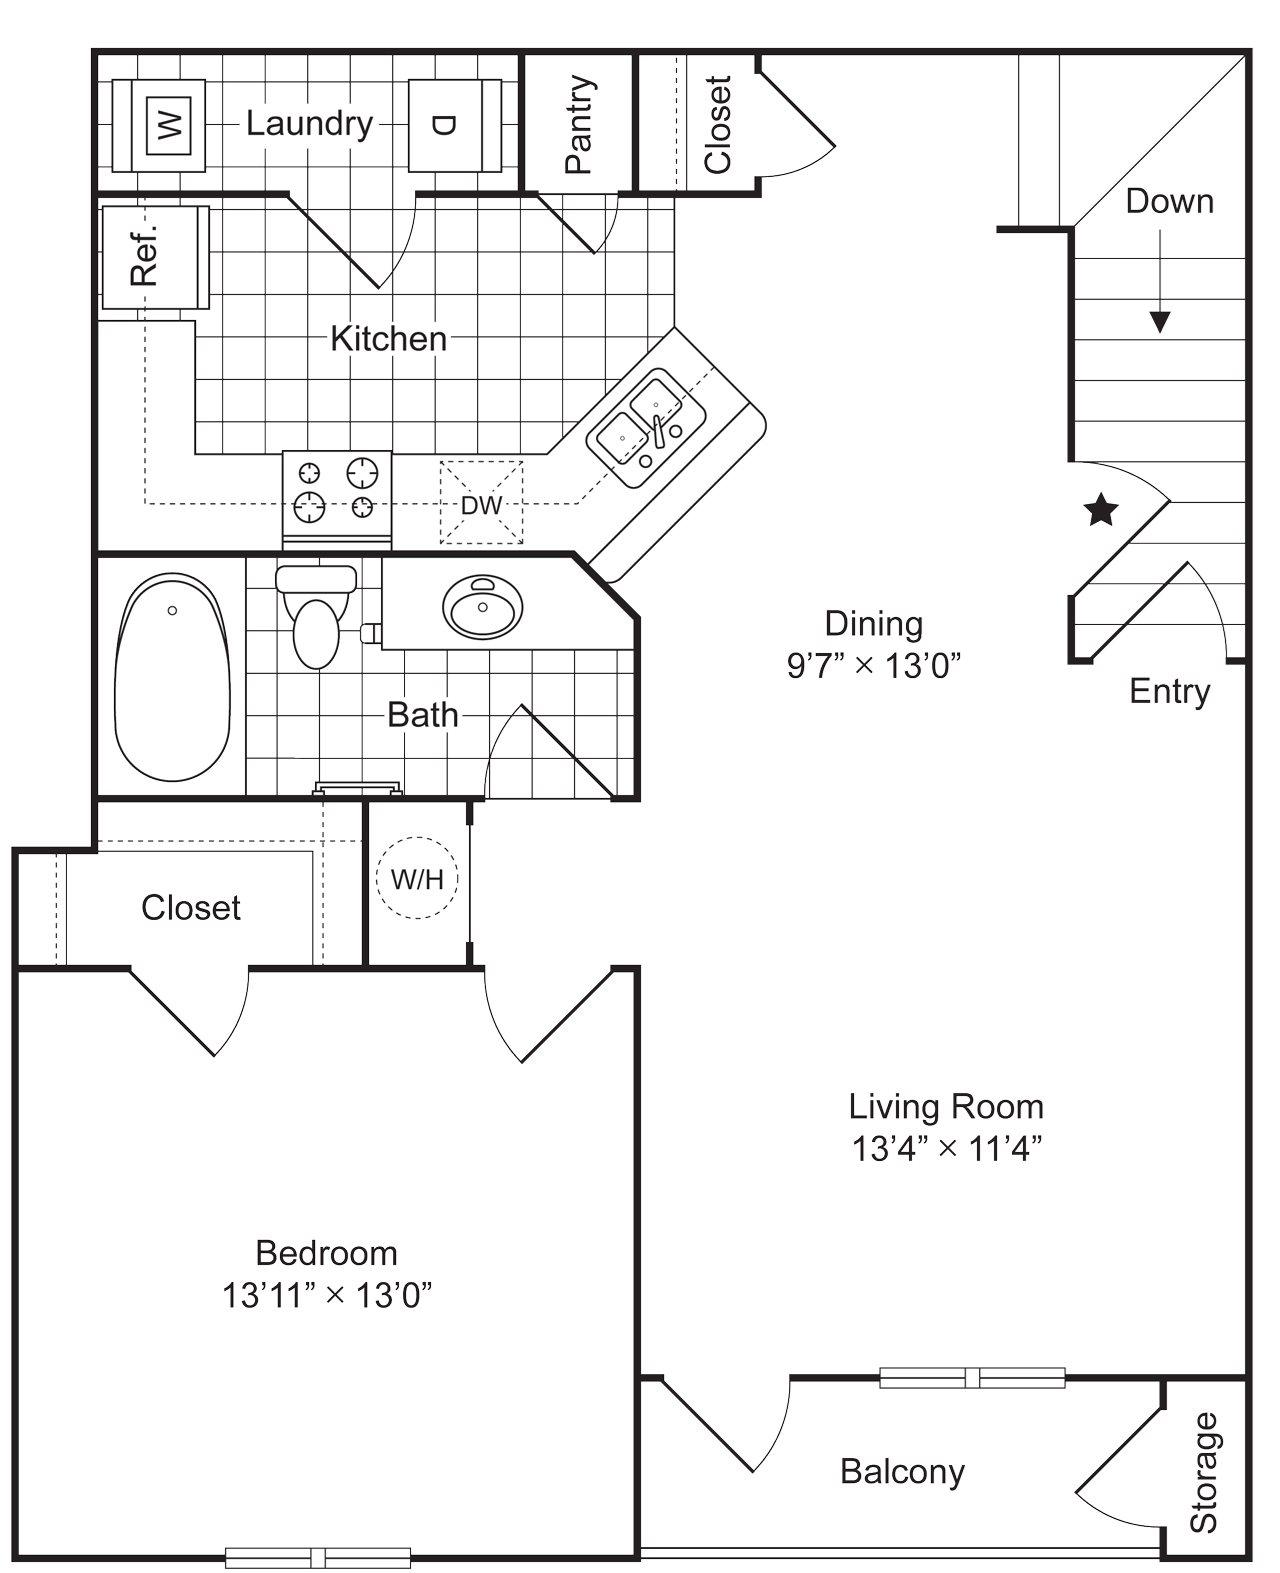 1 Bedroom 1 Bath 963 sqft (A2G) Floor Plan 4